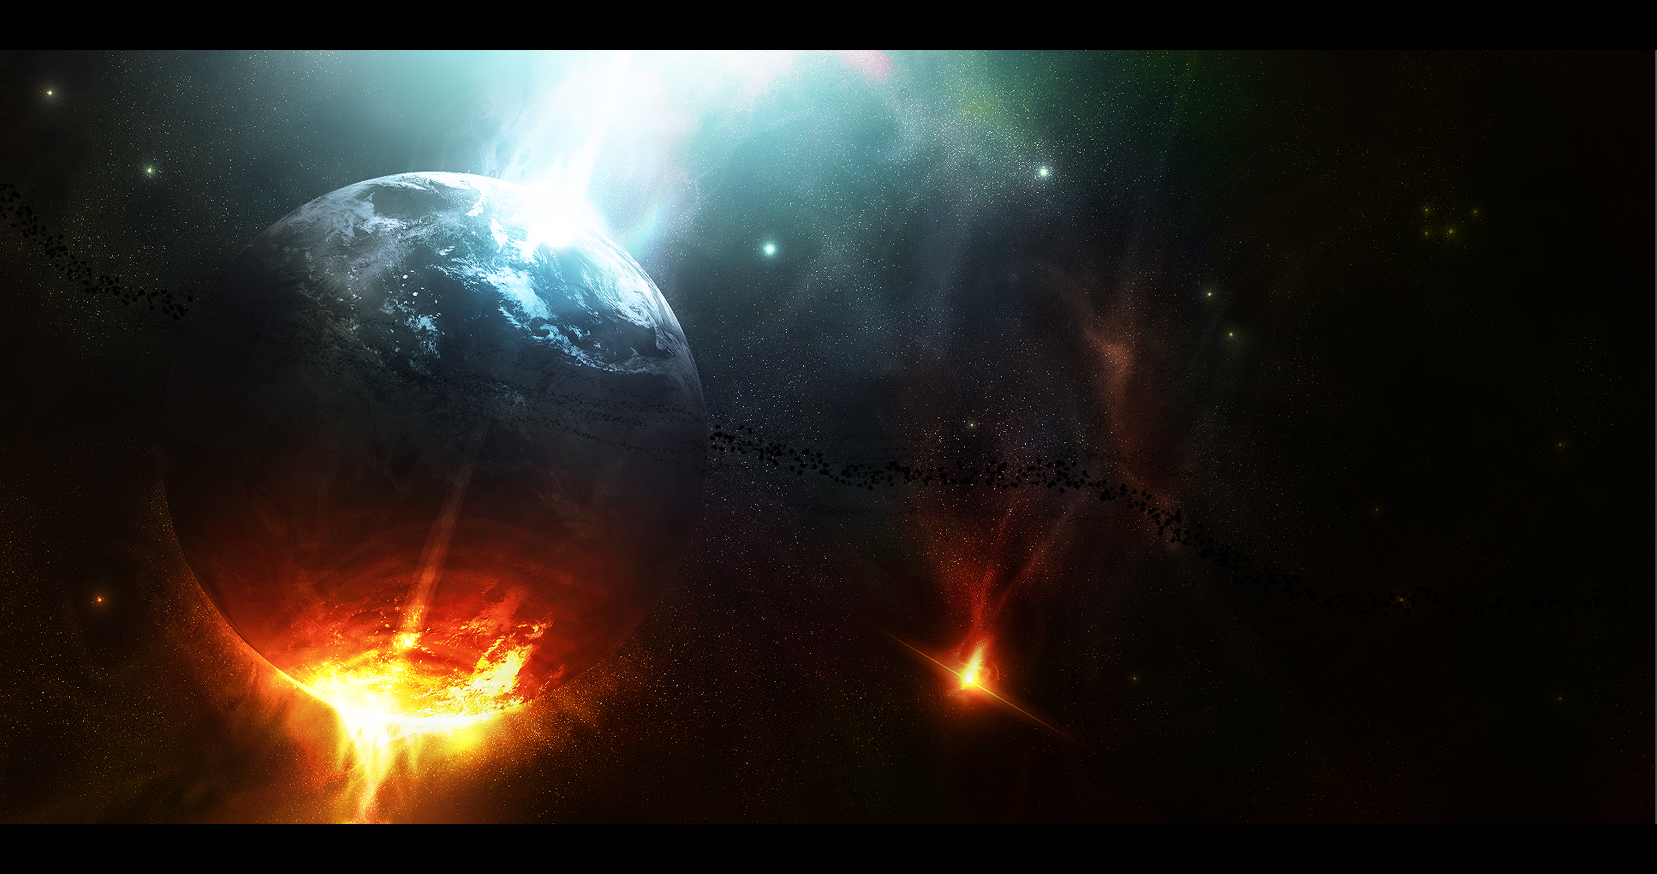 I'll burn you down. by BrokeNL